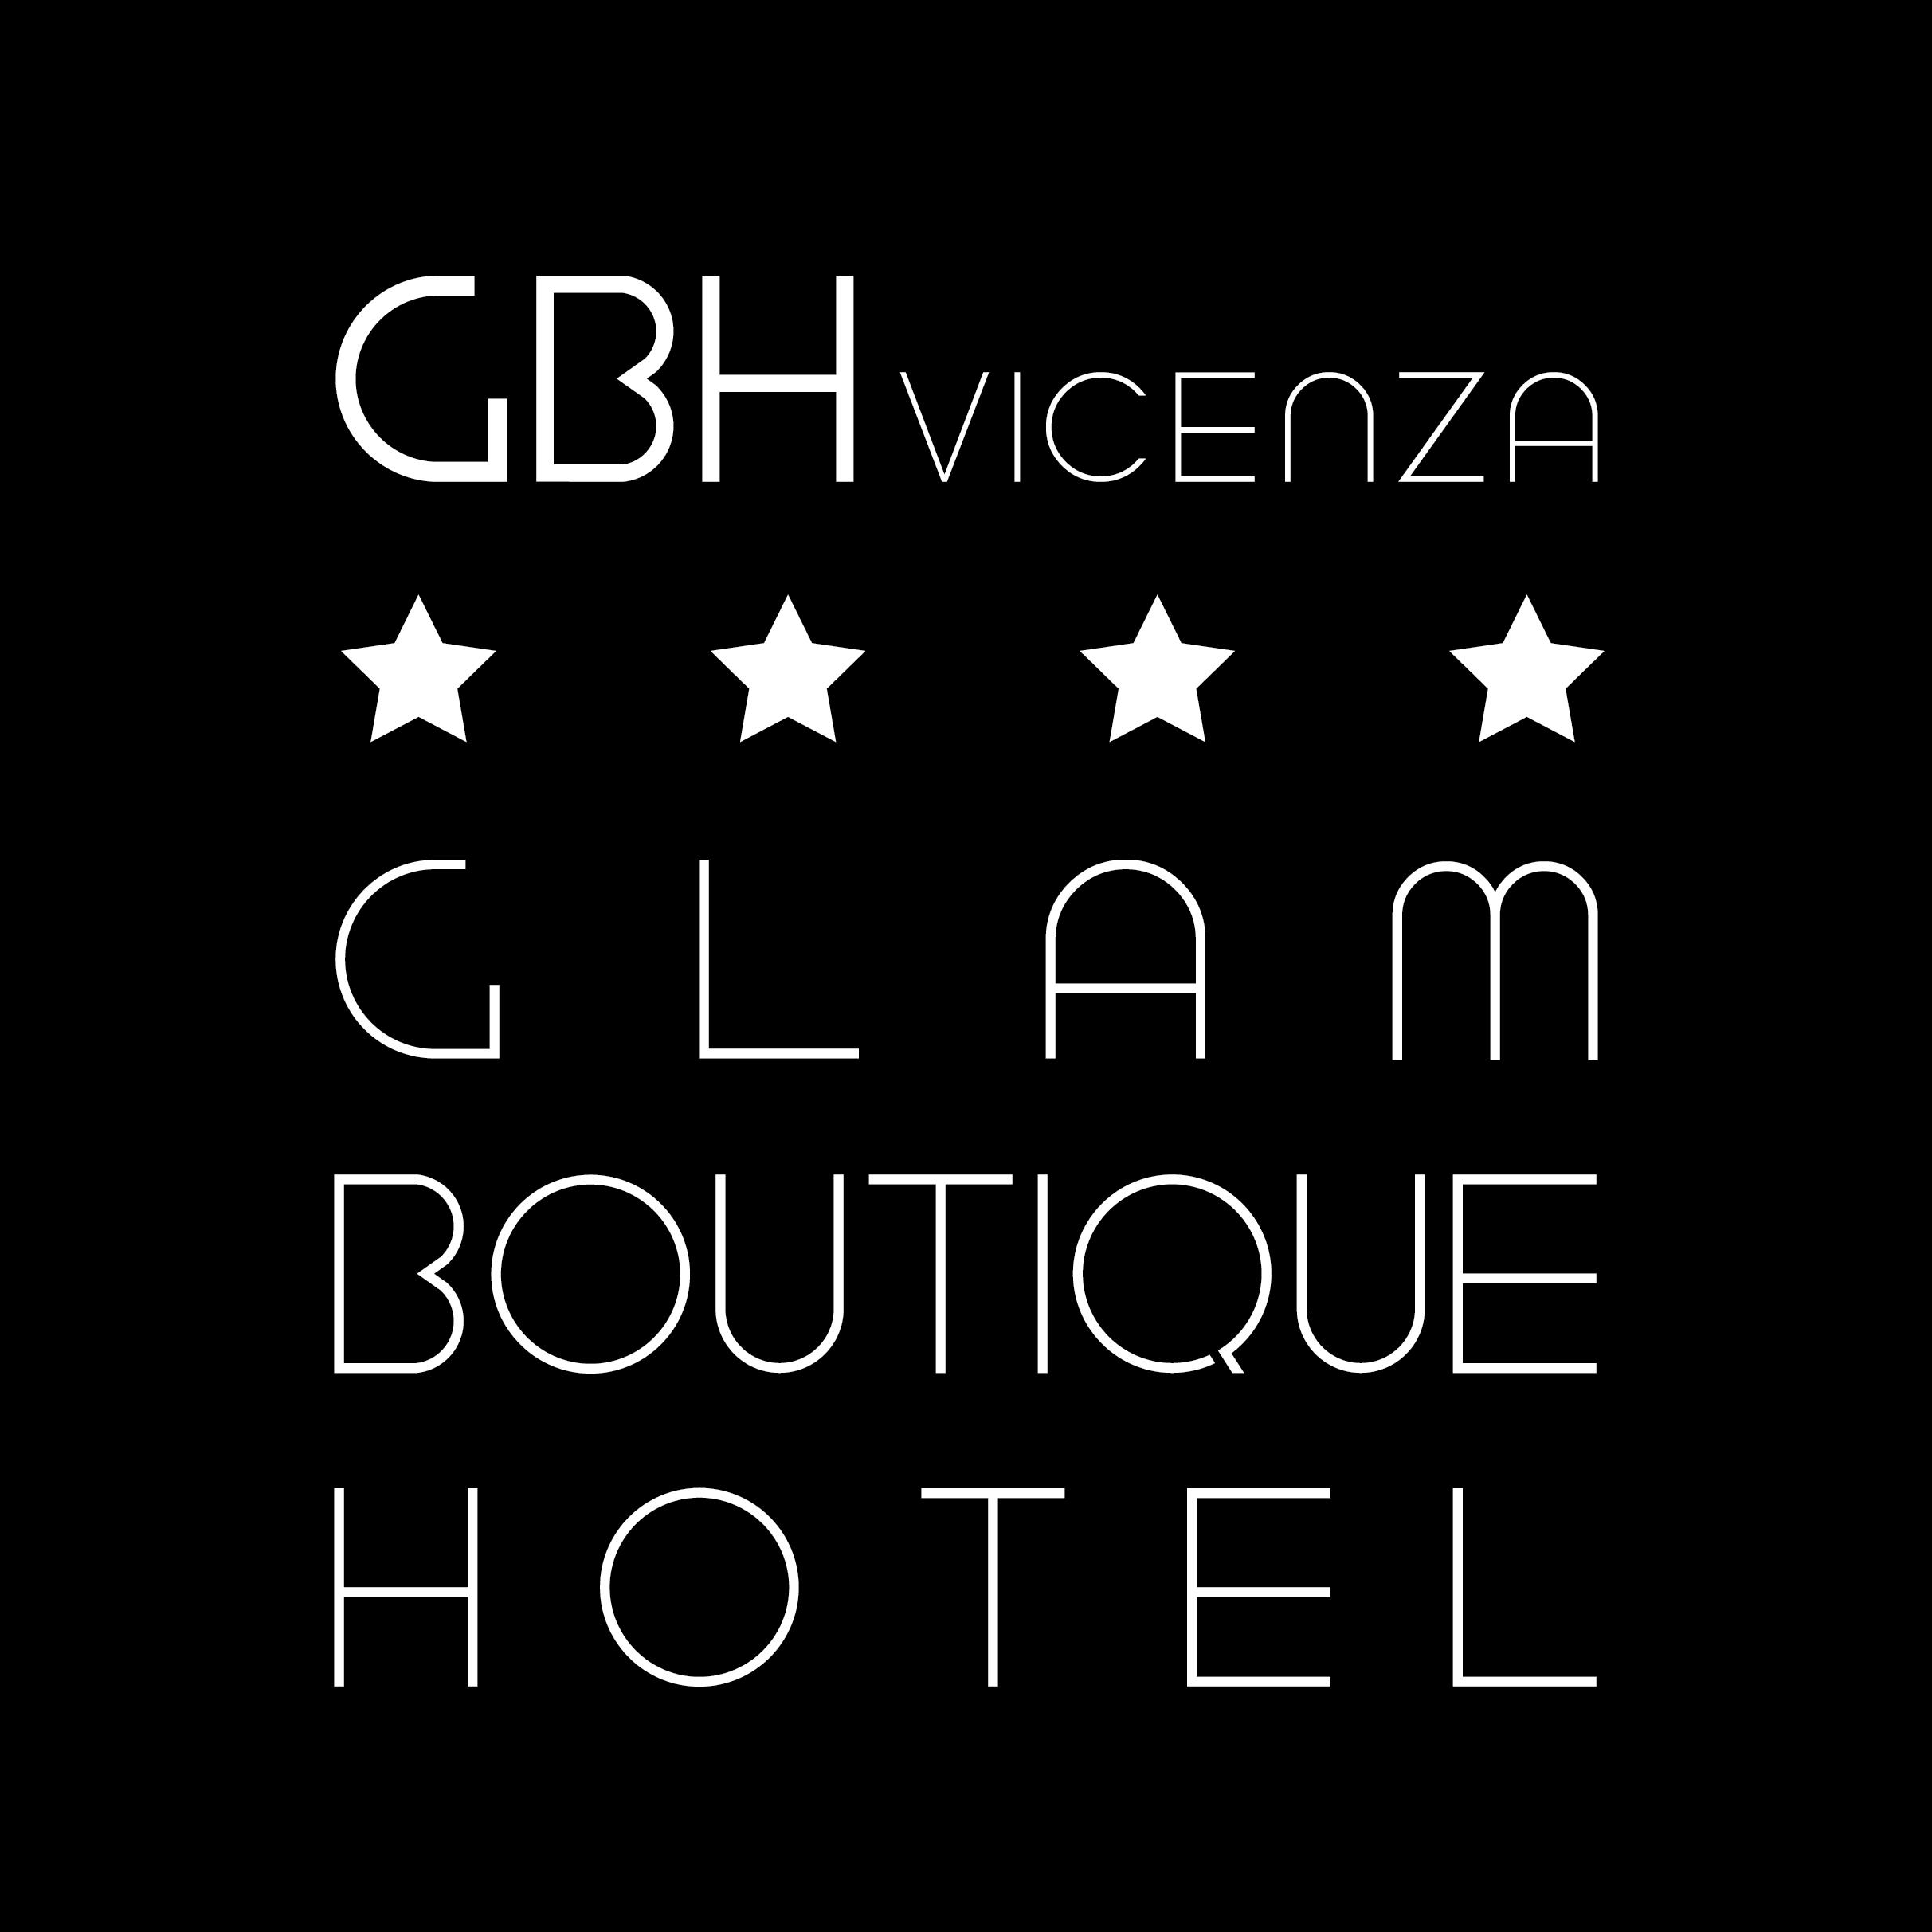 GBH Vicenza_con stelle grande